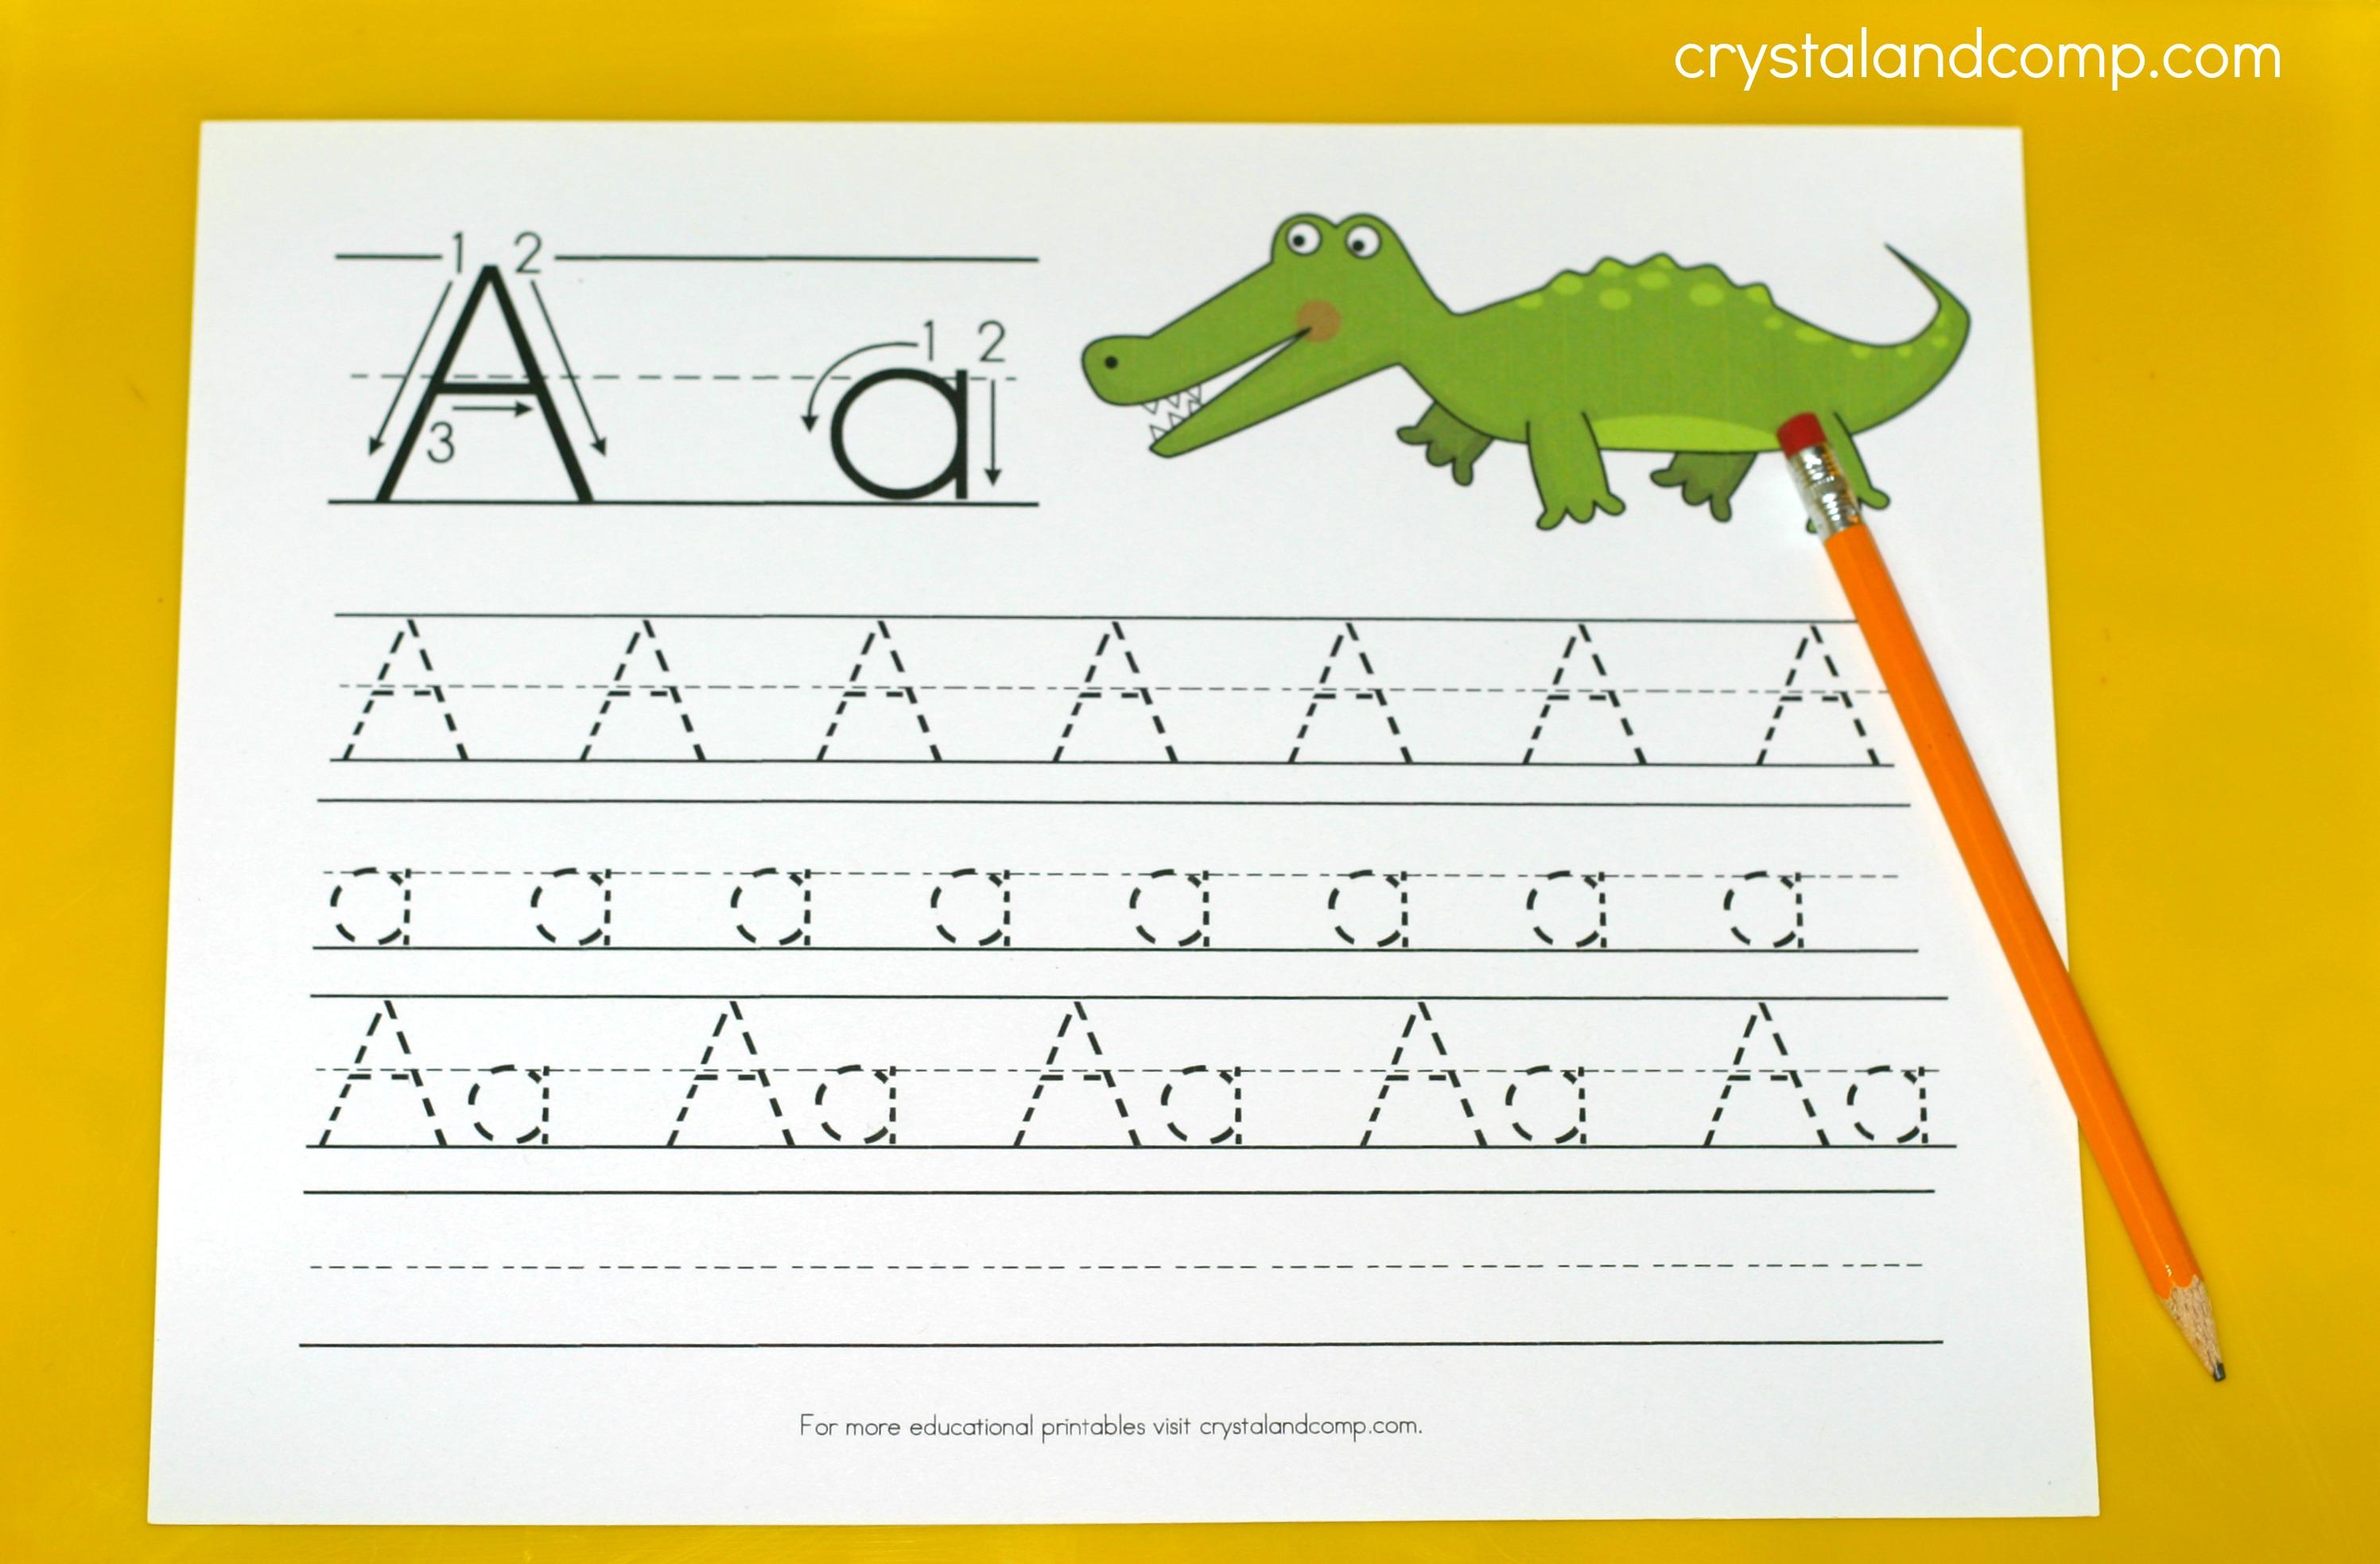 Printable handwriting lined paper pdf  WordPresscom